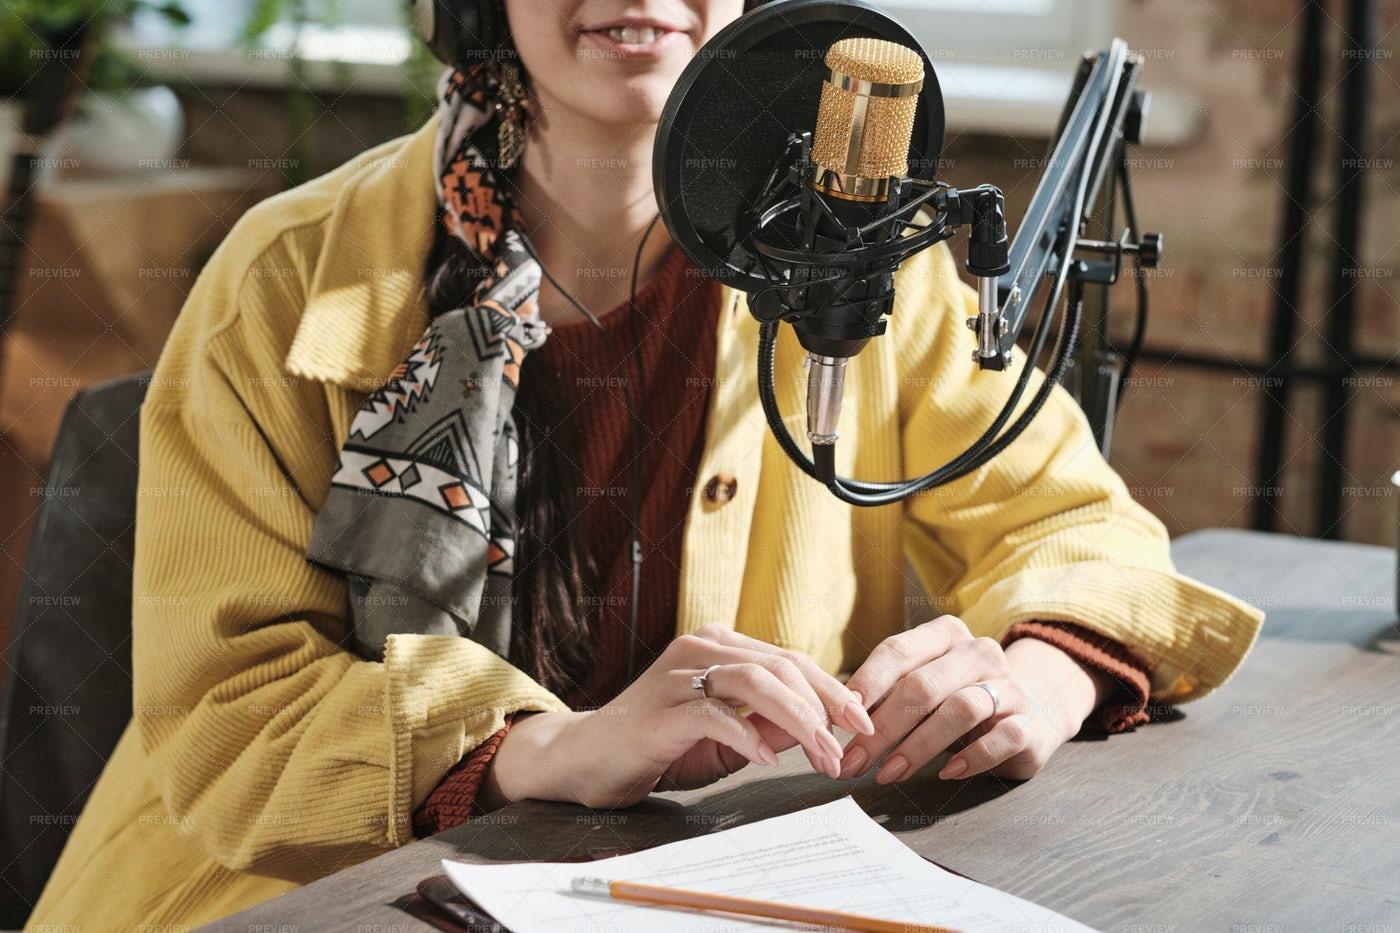 Female Radio Dj At Work: Stock Photos